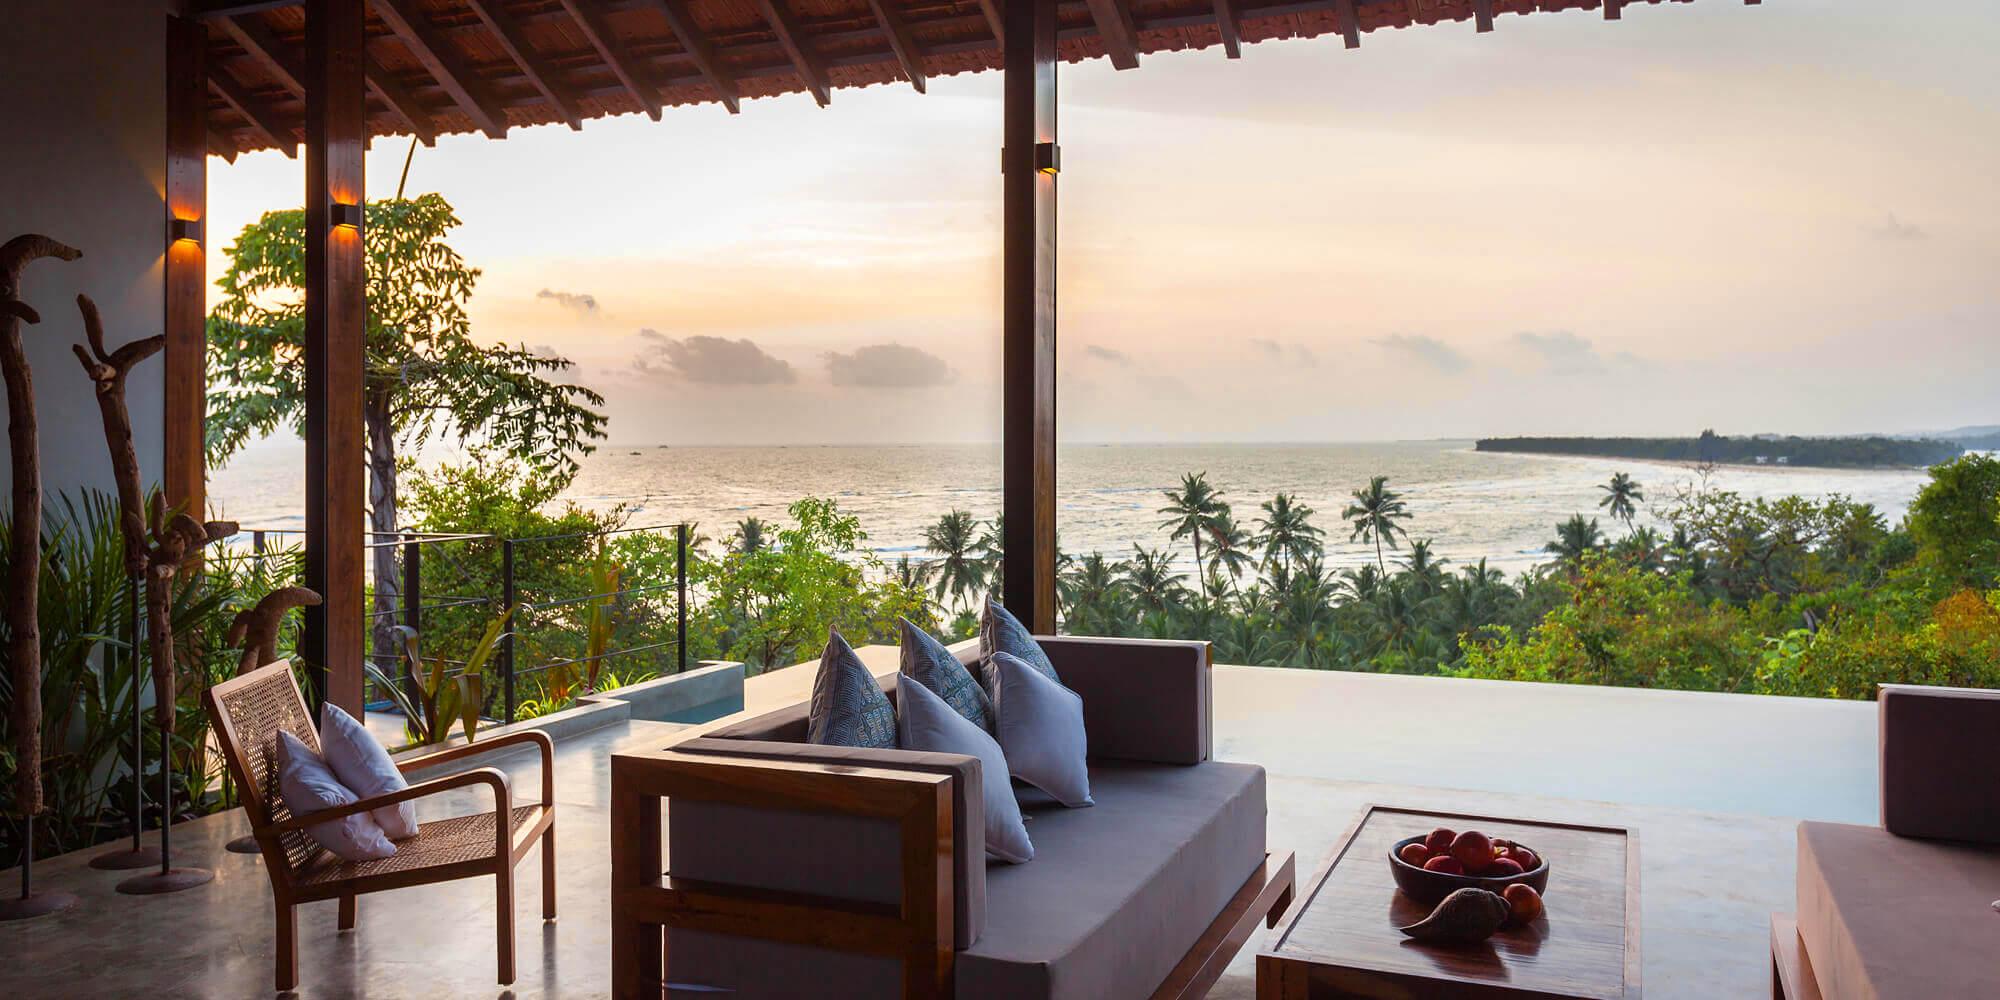 Villa view coco.jpg